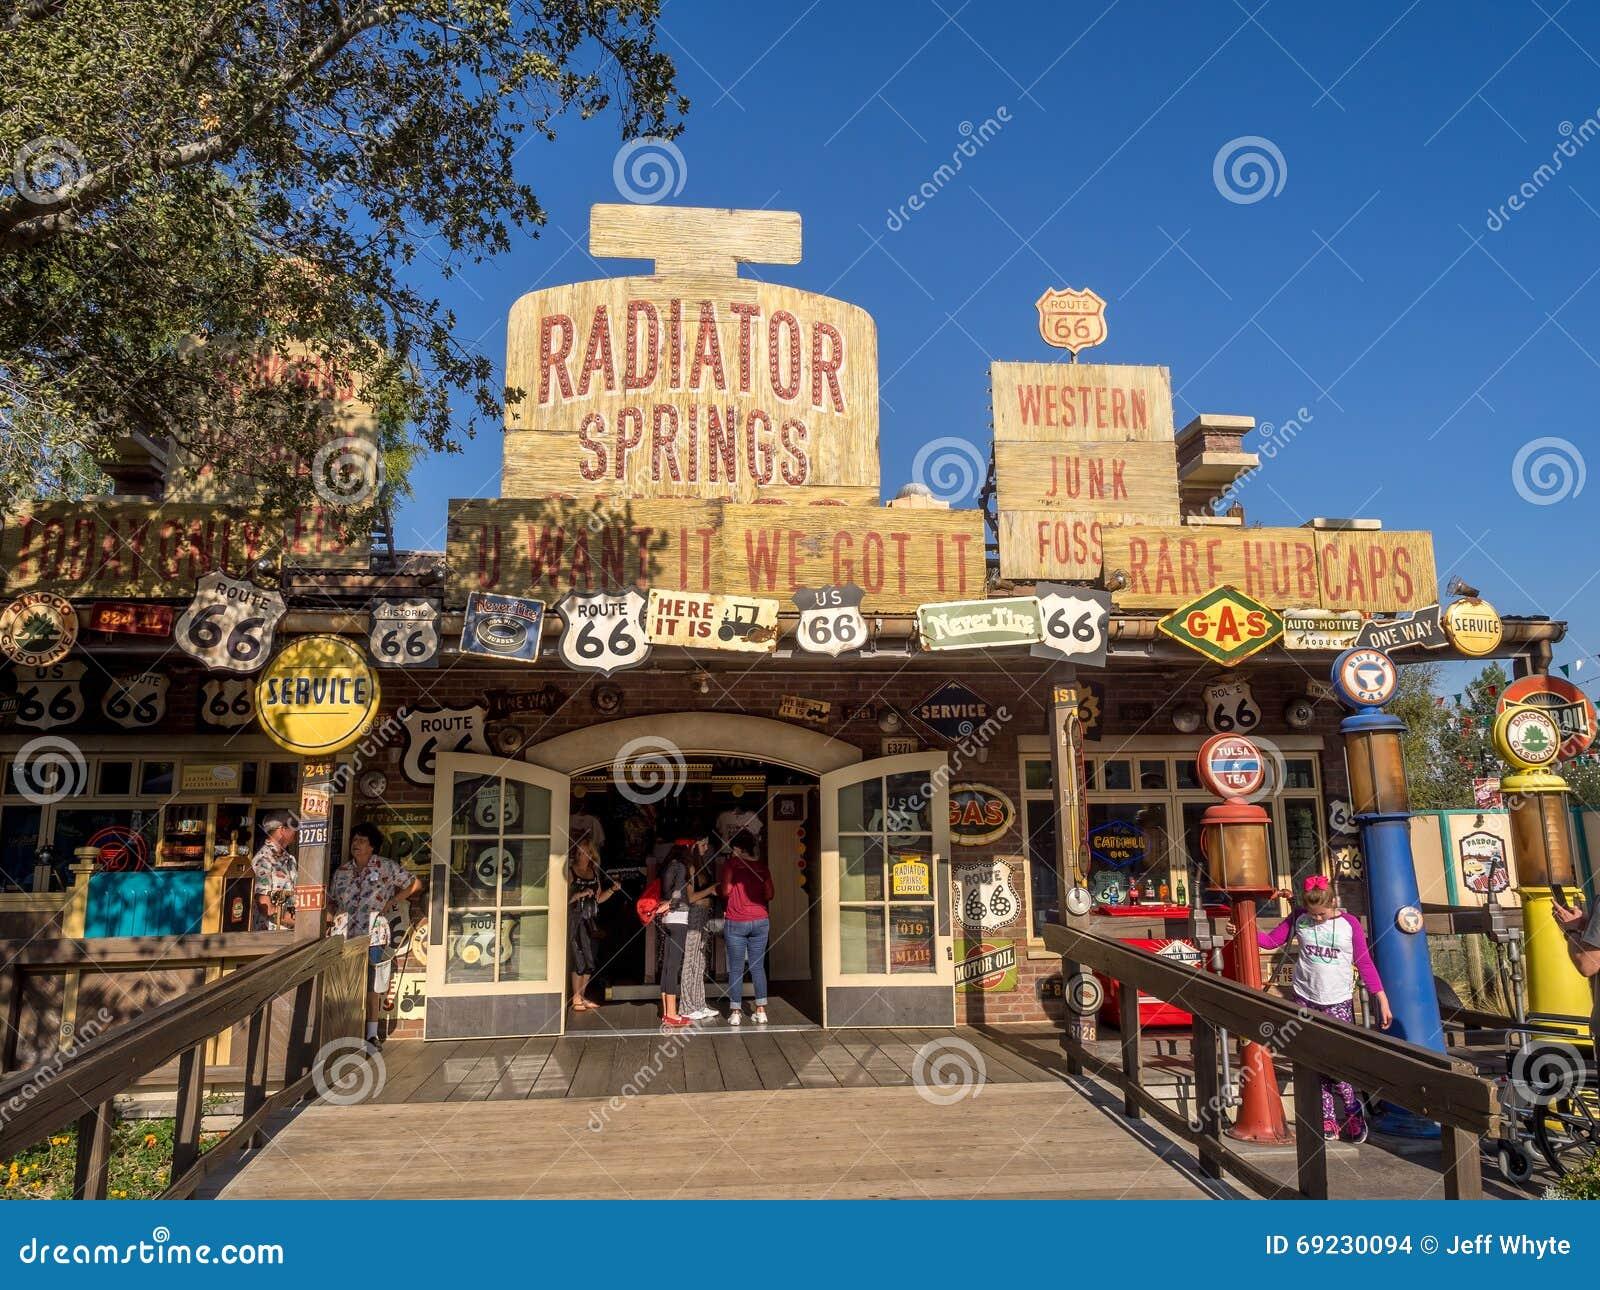 Radiator Springs Gift Shop At Carsland Disney California Adventure Park Editorial Stock Image Image Of Mickey History 69230094